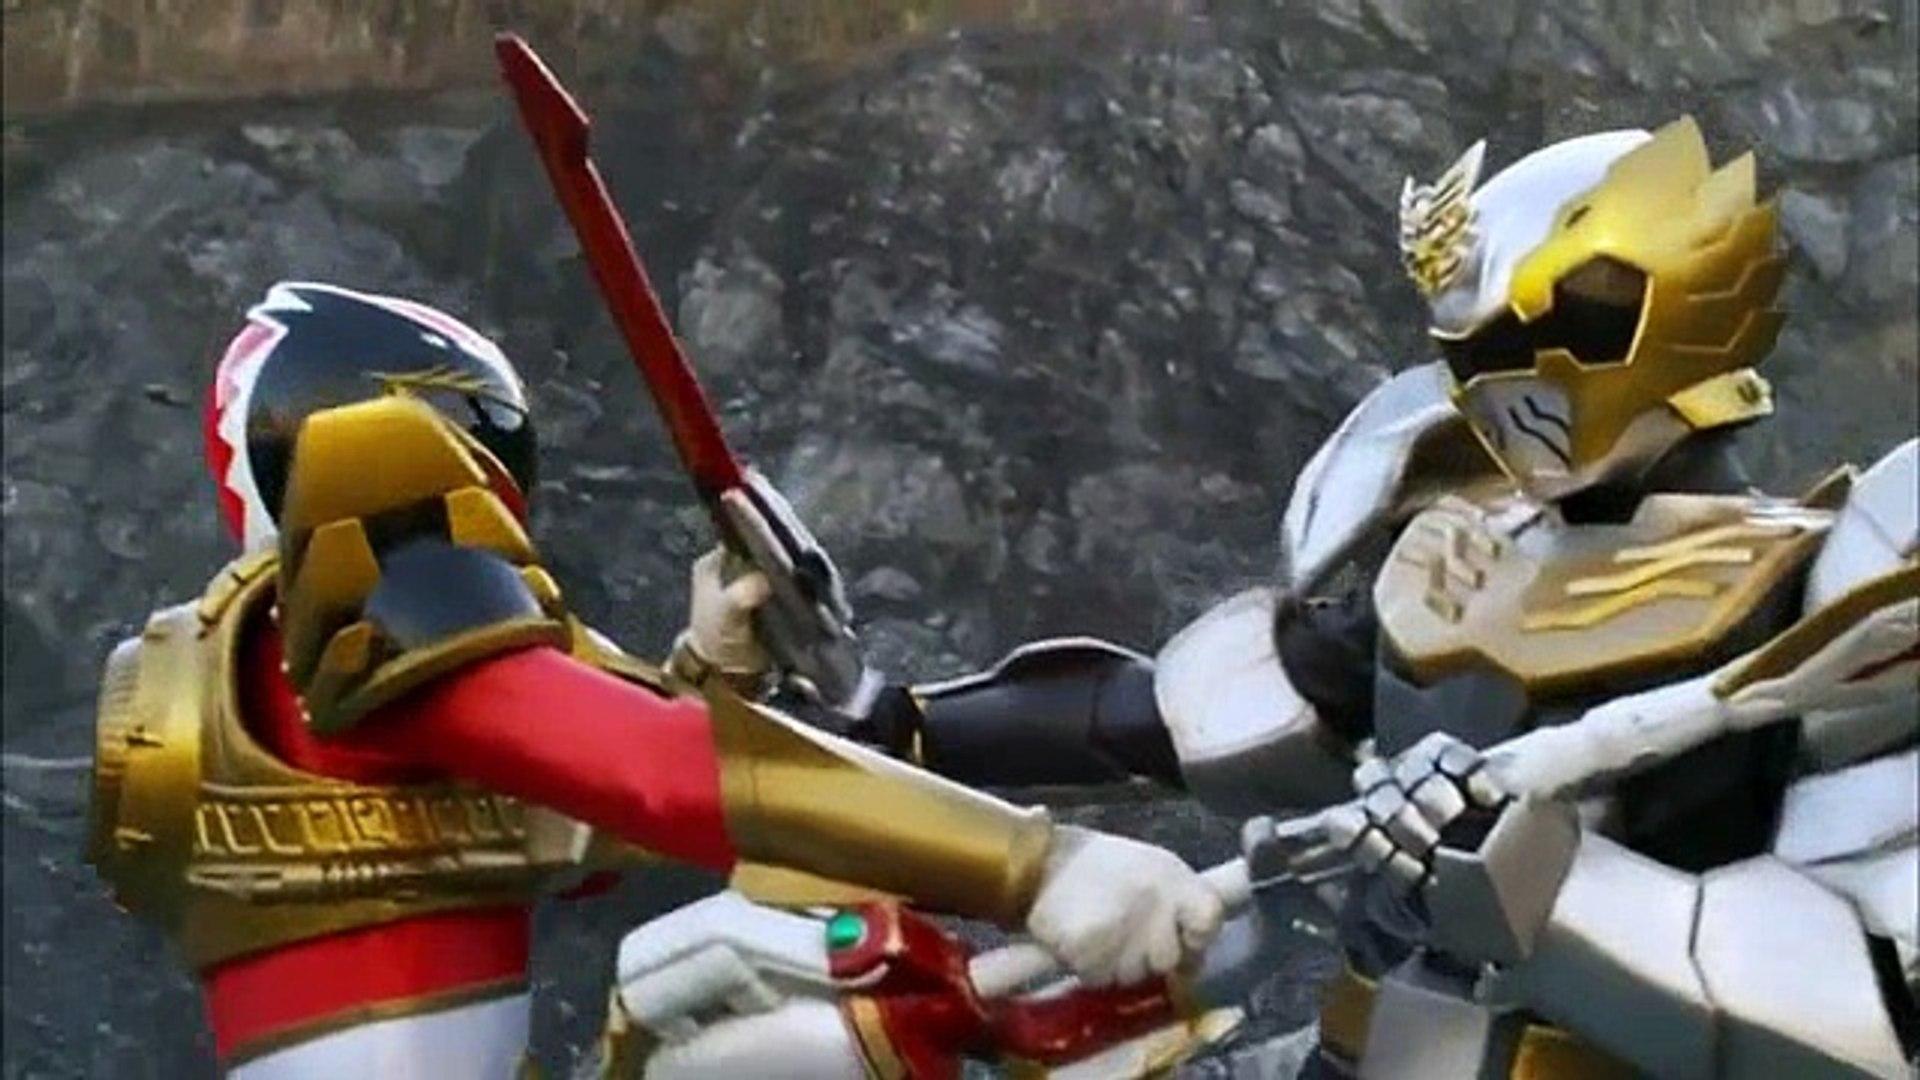 Power Rangers Megaforce S02 E17 Video Dailymotion